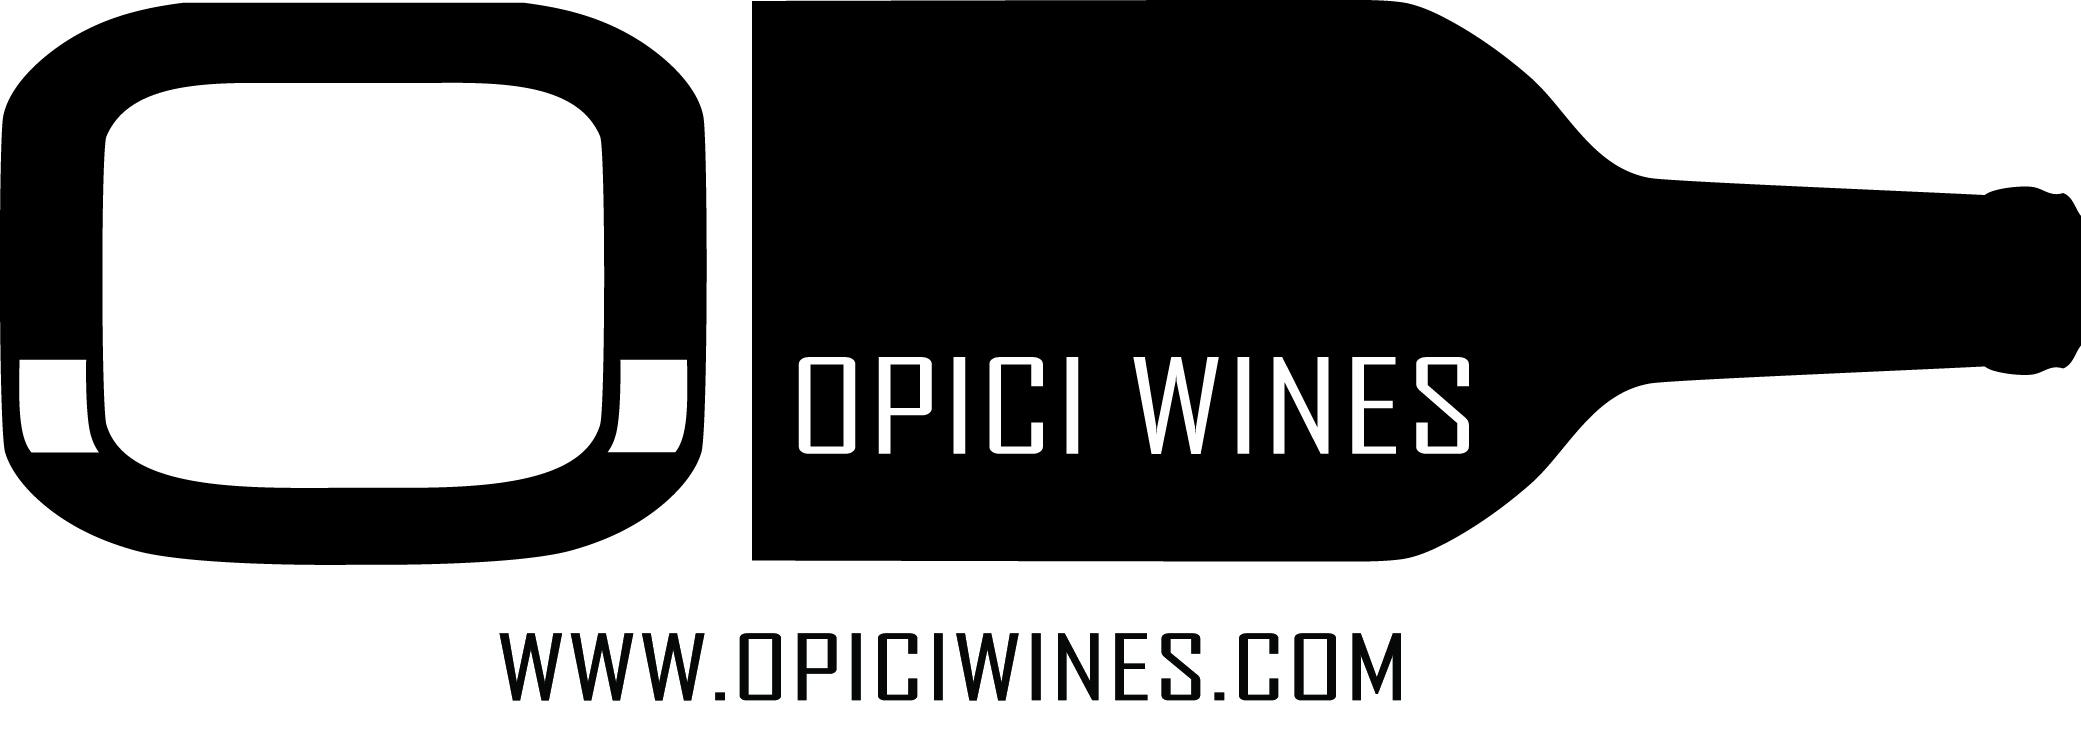 ow_logo_url_blk.jpg